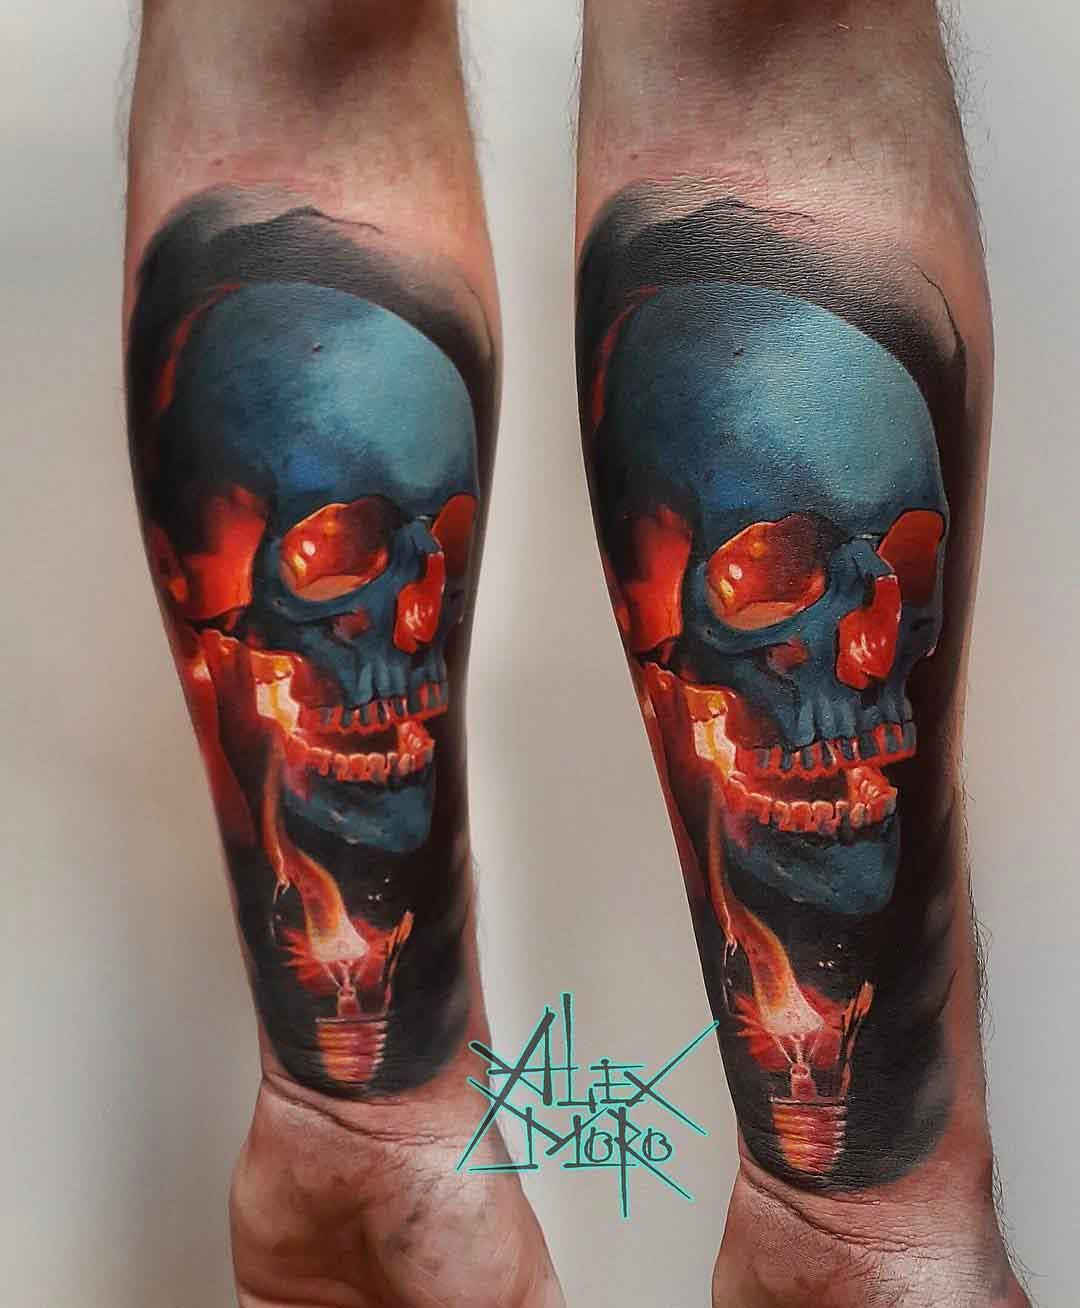 skull tatto on arm and lightbulb